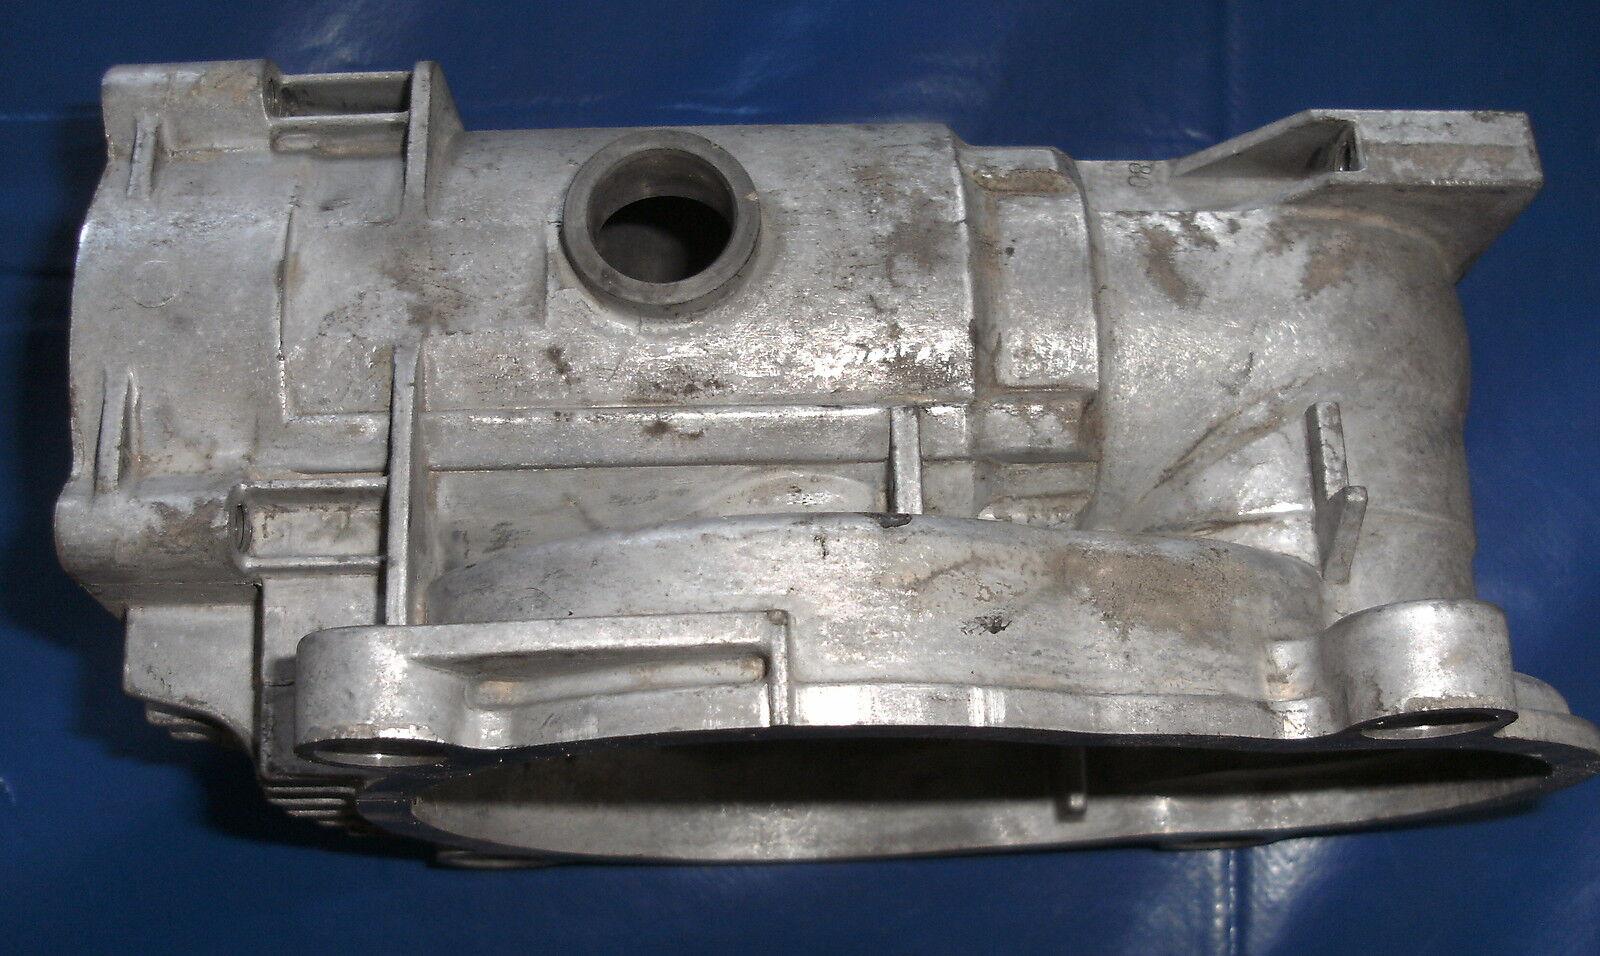 Hilti TE 76 Getriebegehäuse 330435 neu Ersatzteil Te76 ATC, TE 76 P ATC, Te 76 P